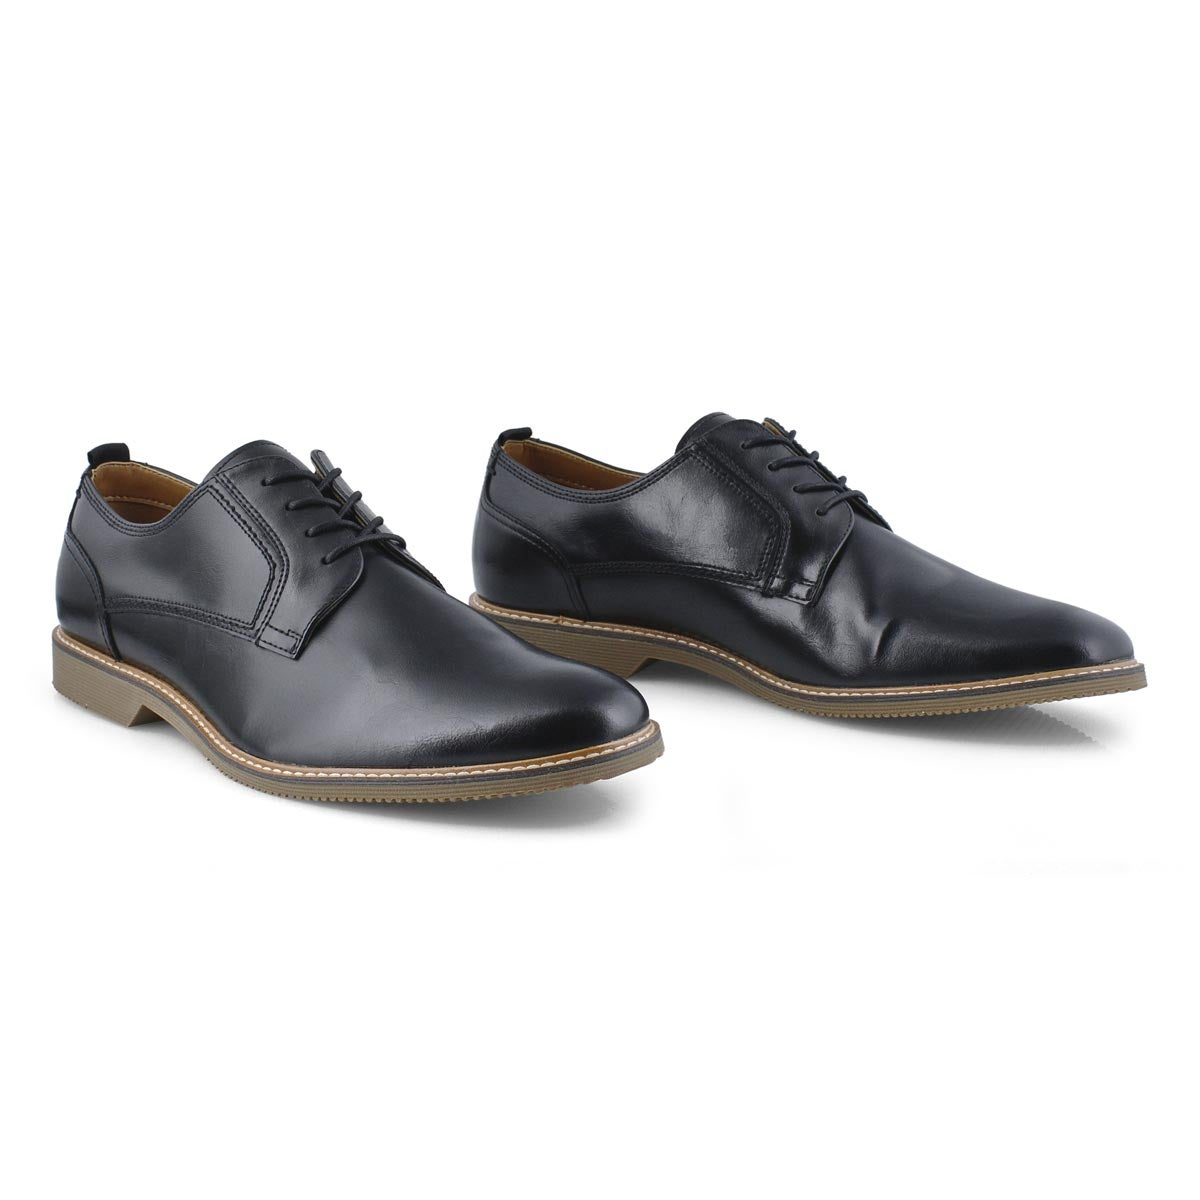 Men's P-Dafni Casual Oxford - Black